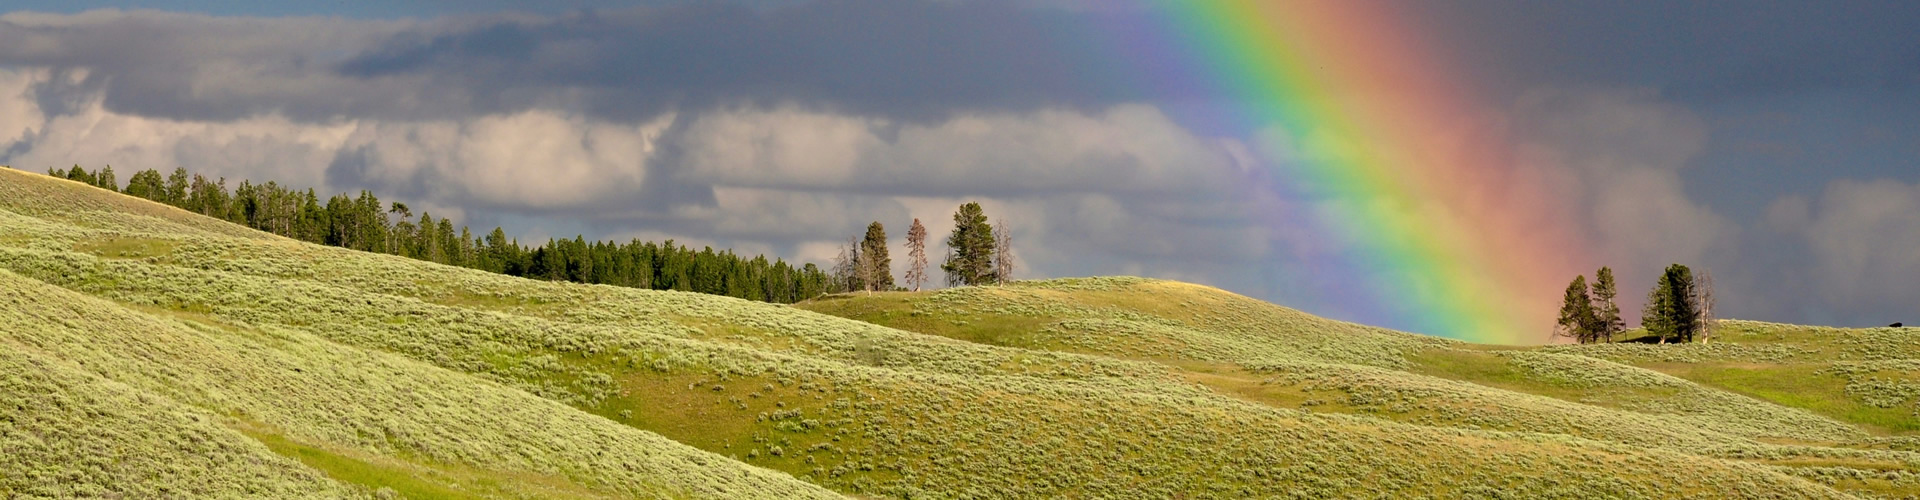 plans-rainbow